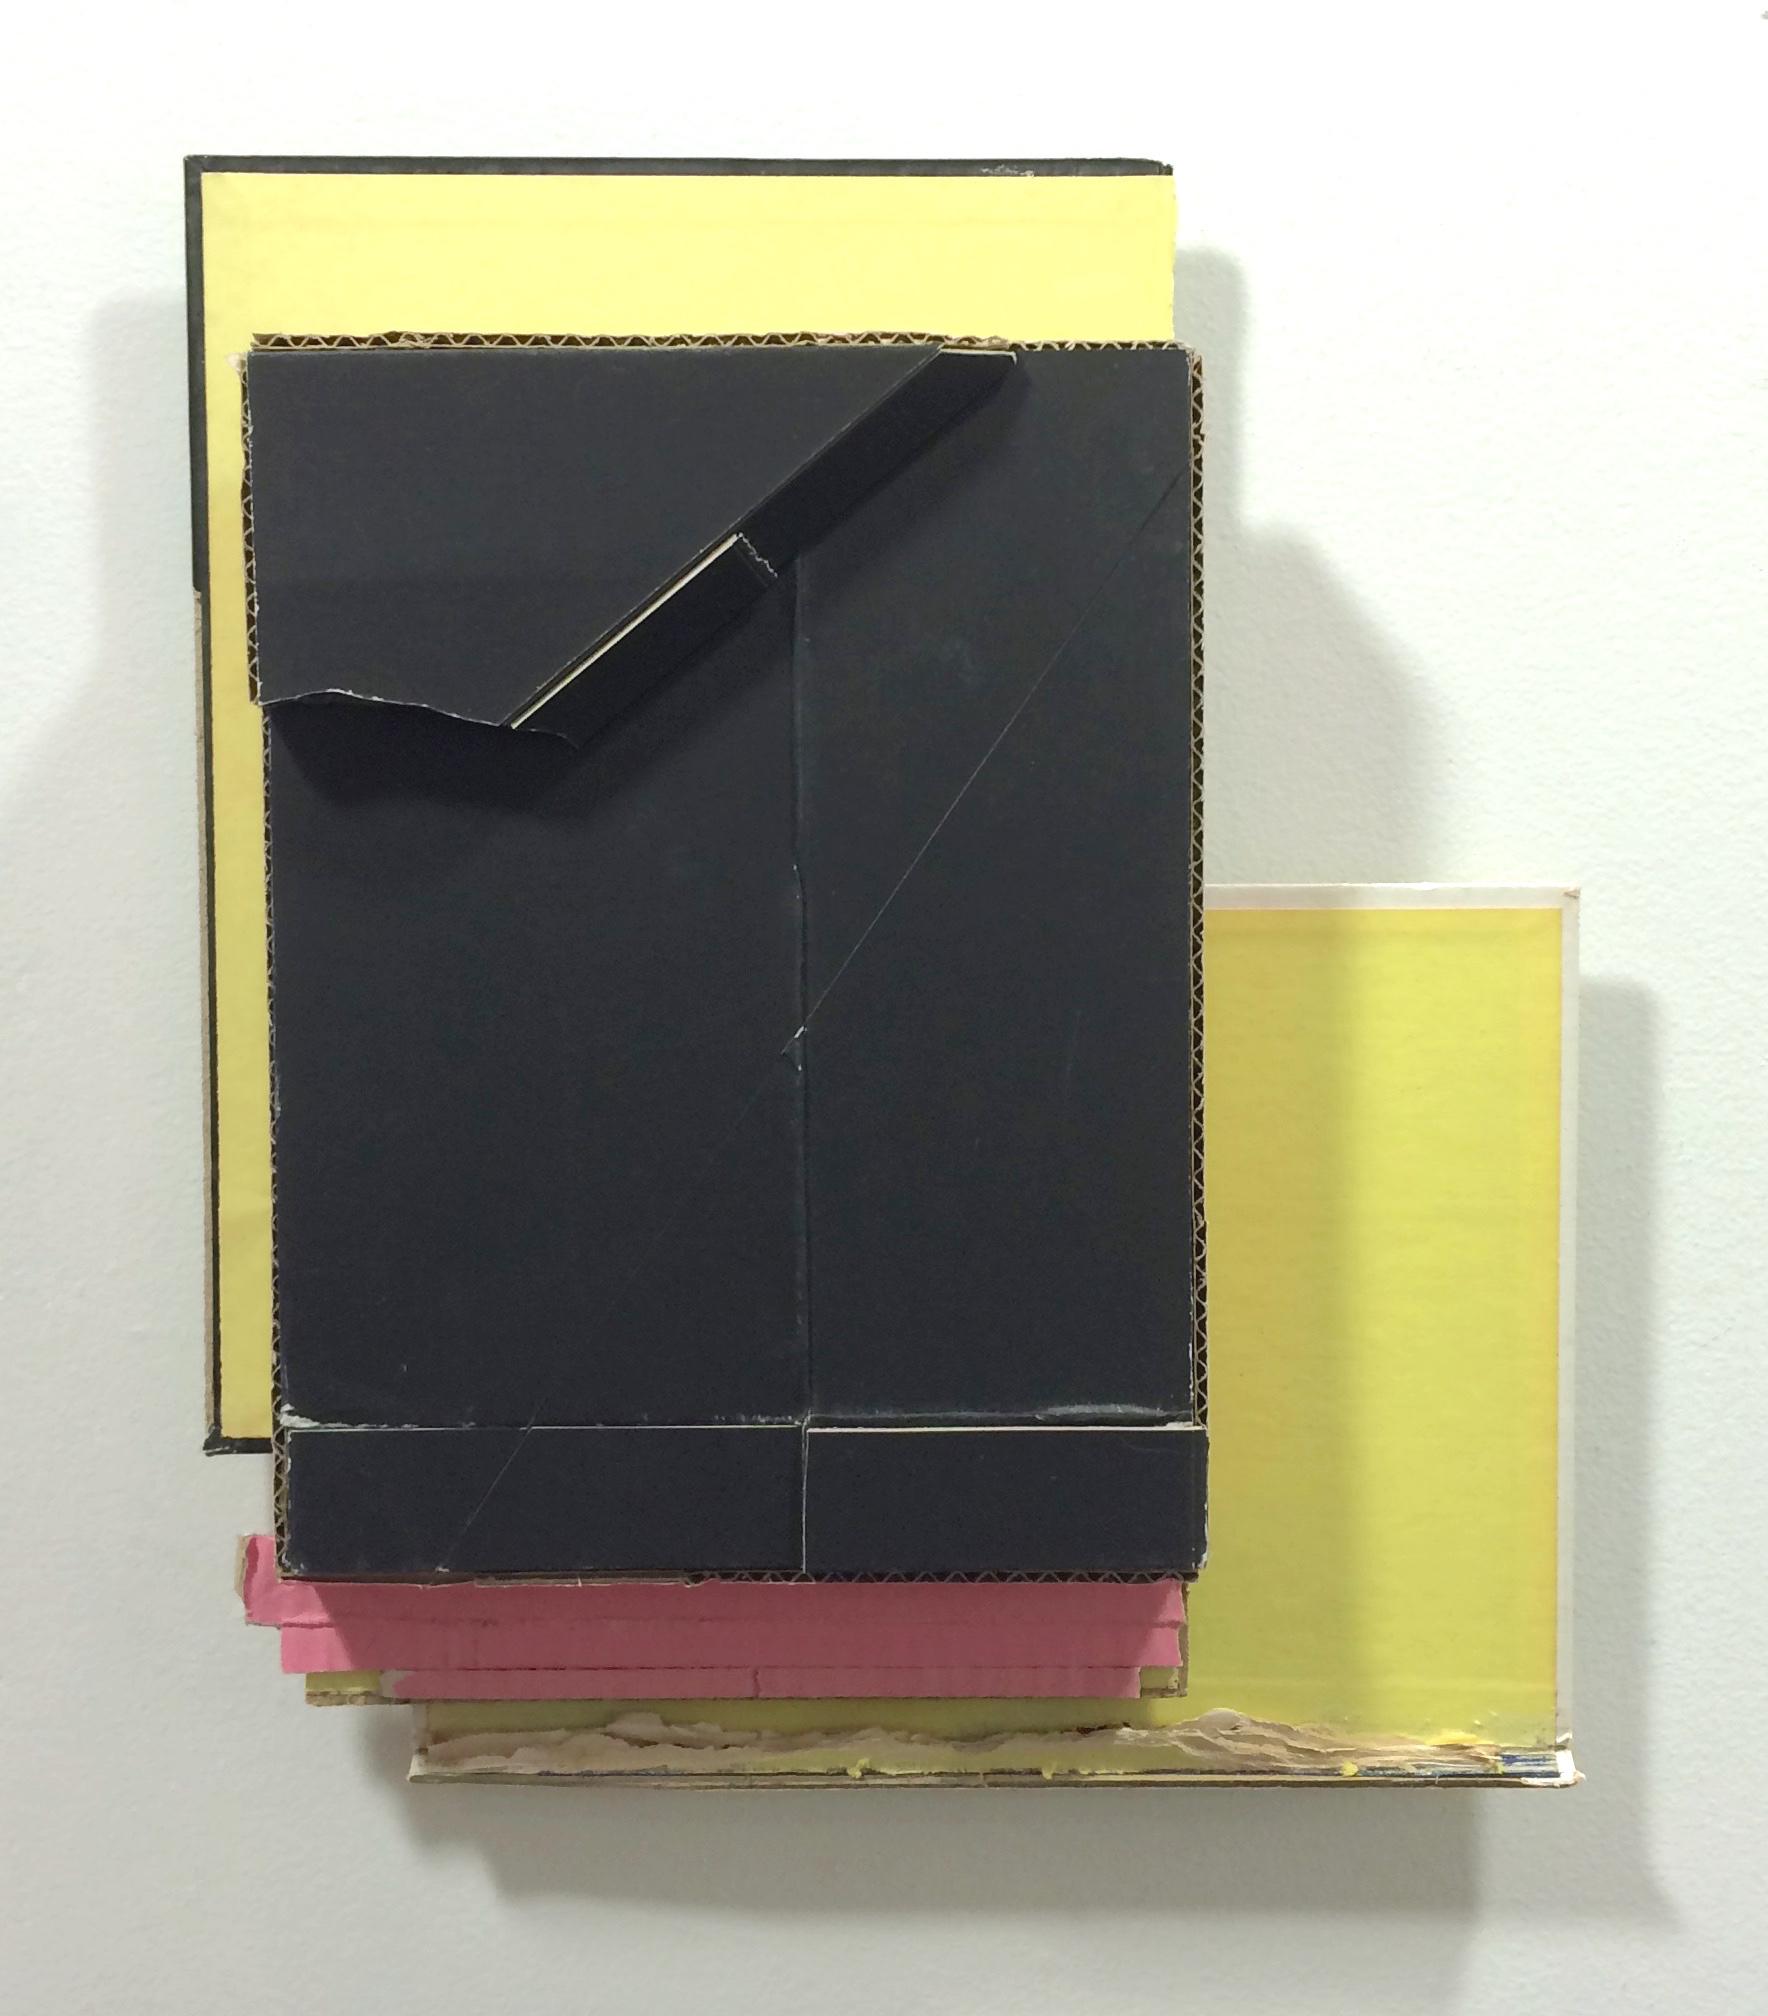 Corner Lot 2 ,  2015  found (unpainted) cardboard, cut book cover  14.25 x 12 x 2.75 inches